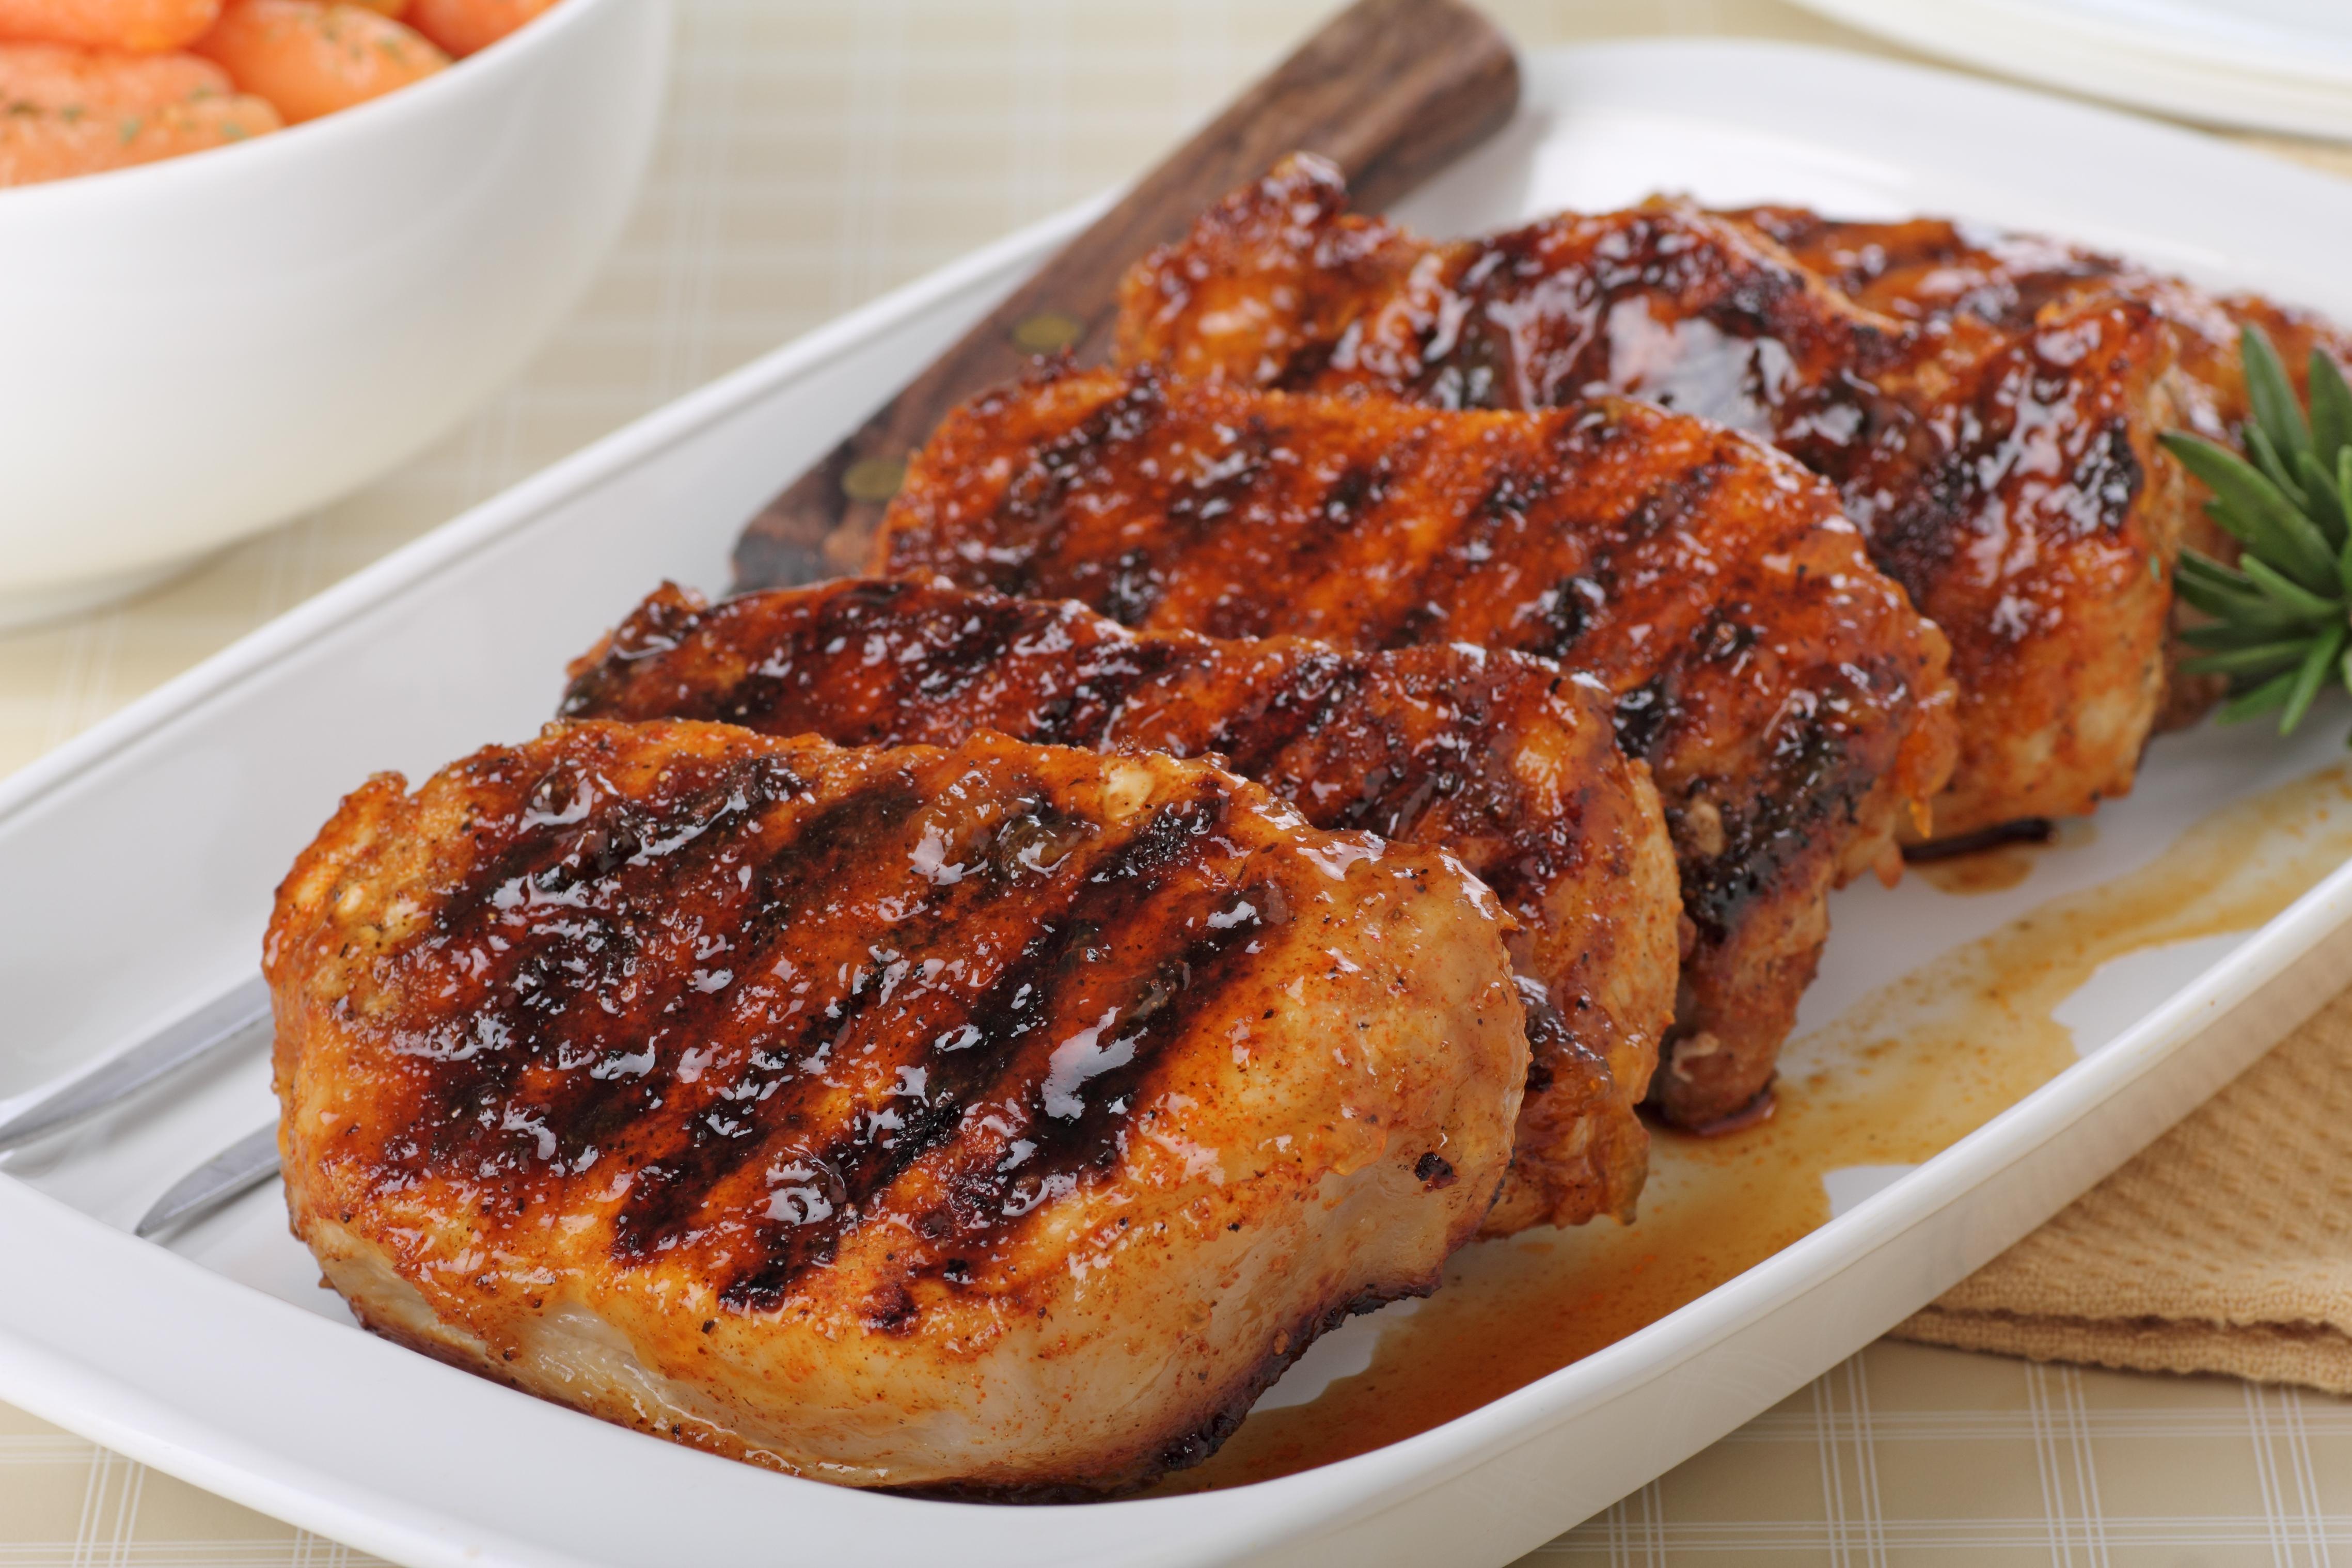 grilled pork chop recipes with brown sugar Grilled Brown Sugar Pork Chops - Alisons Pantry Delicious Living Blog